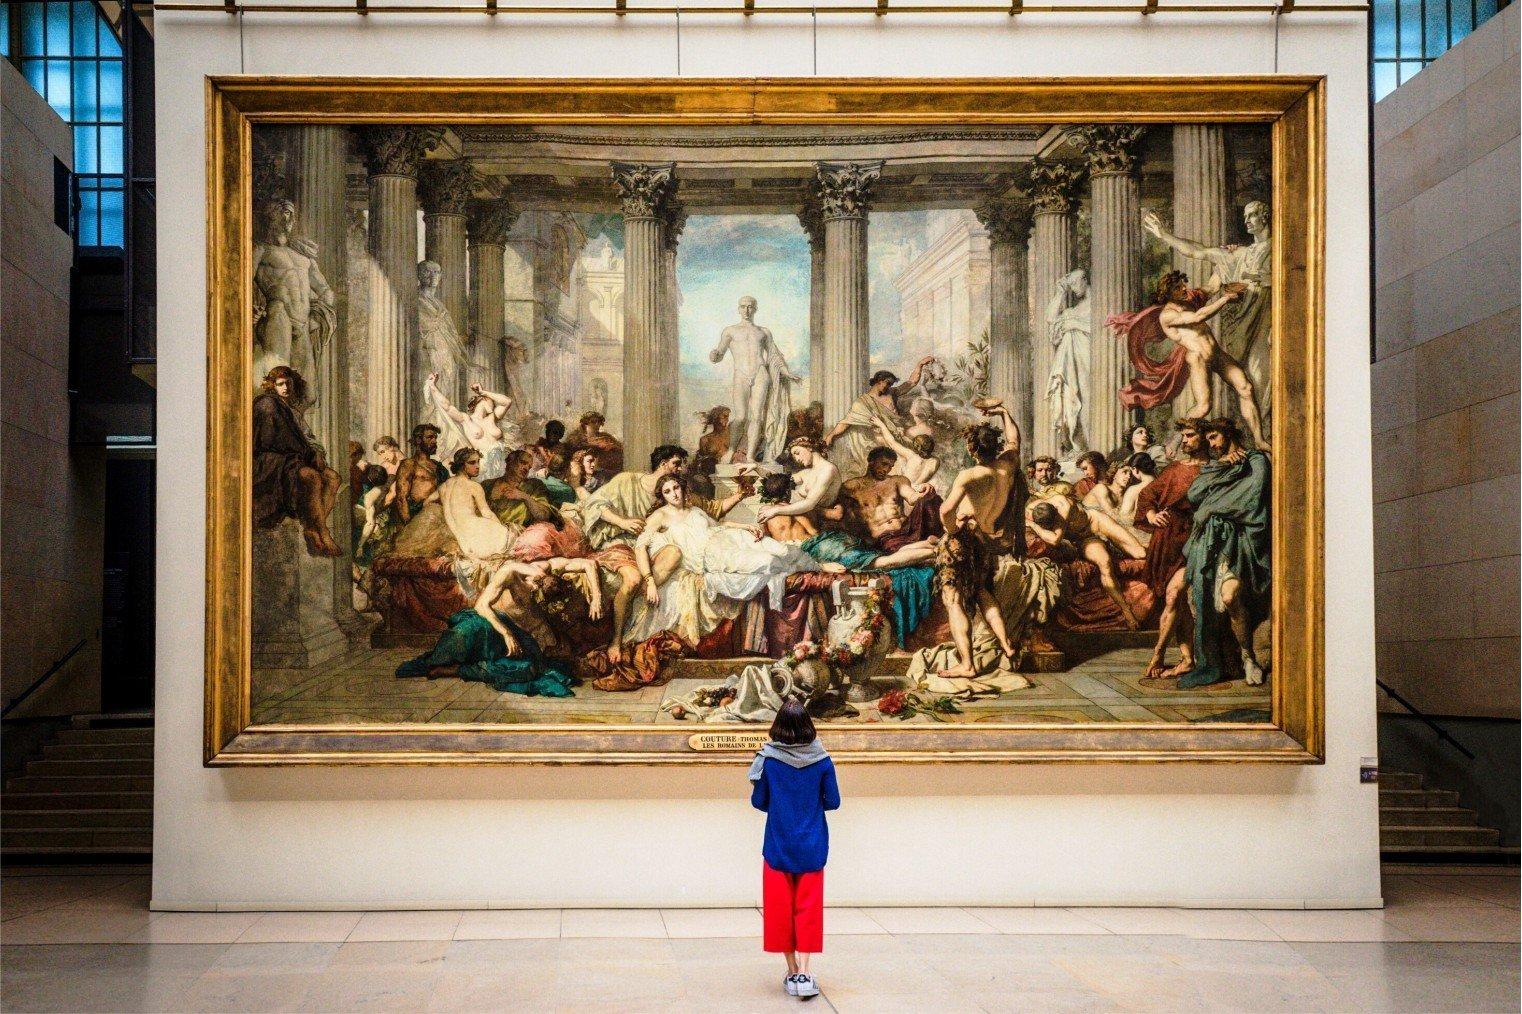 Musee d'Orsay. Музей Орсе, Париж. Туризм, информация о музее.